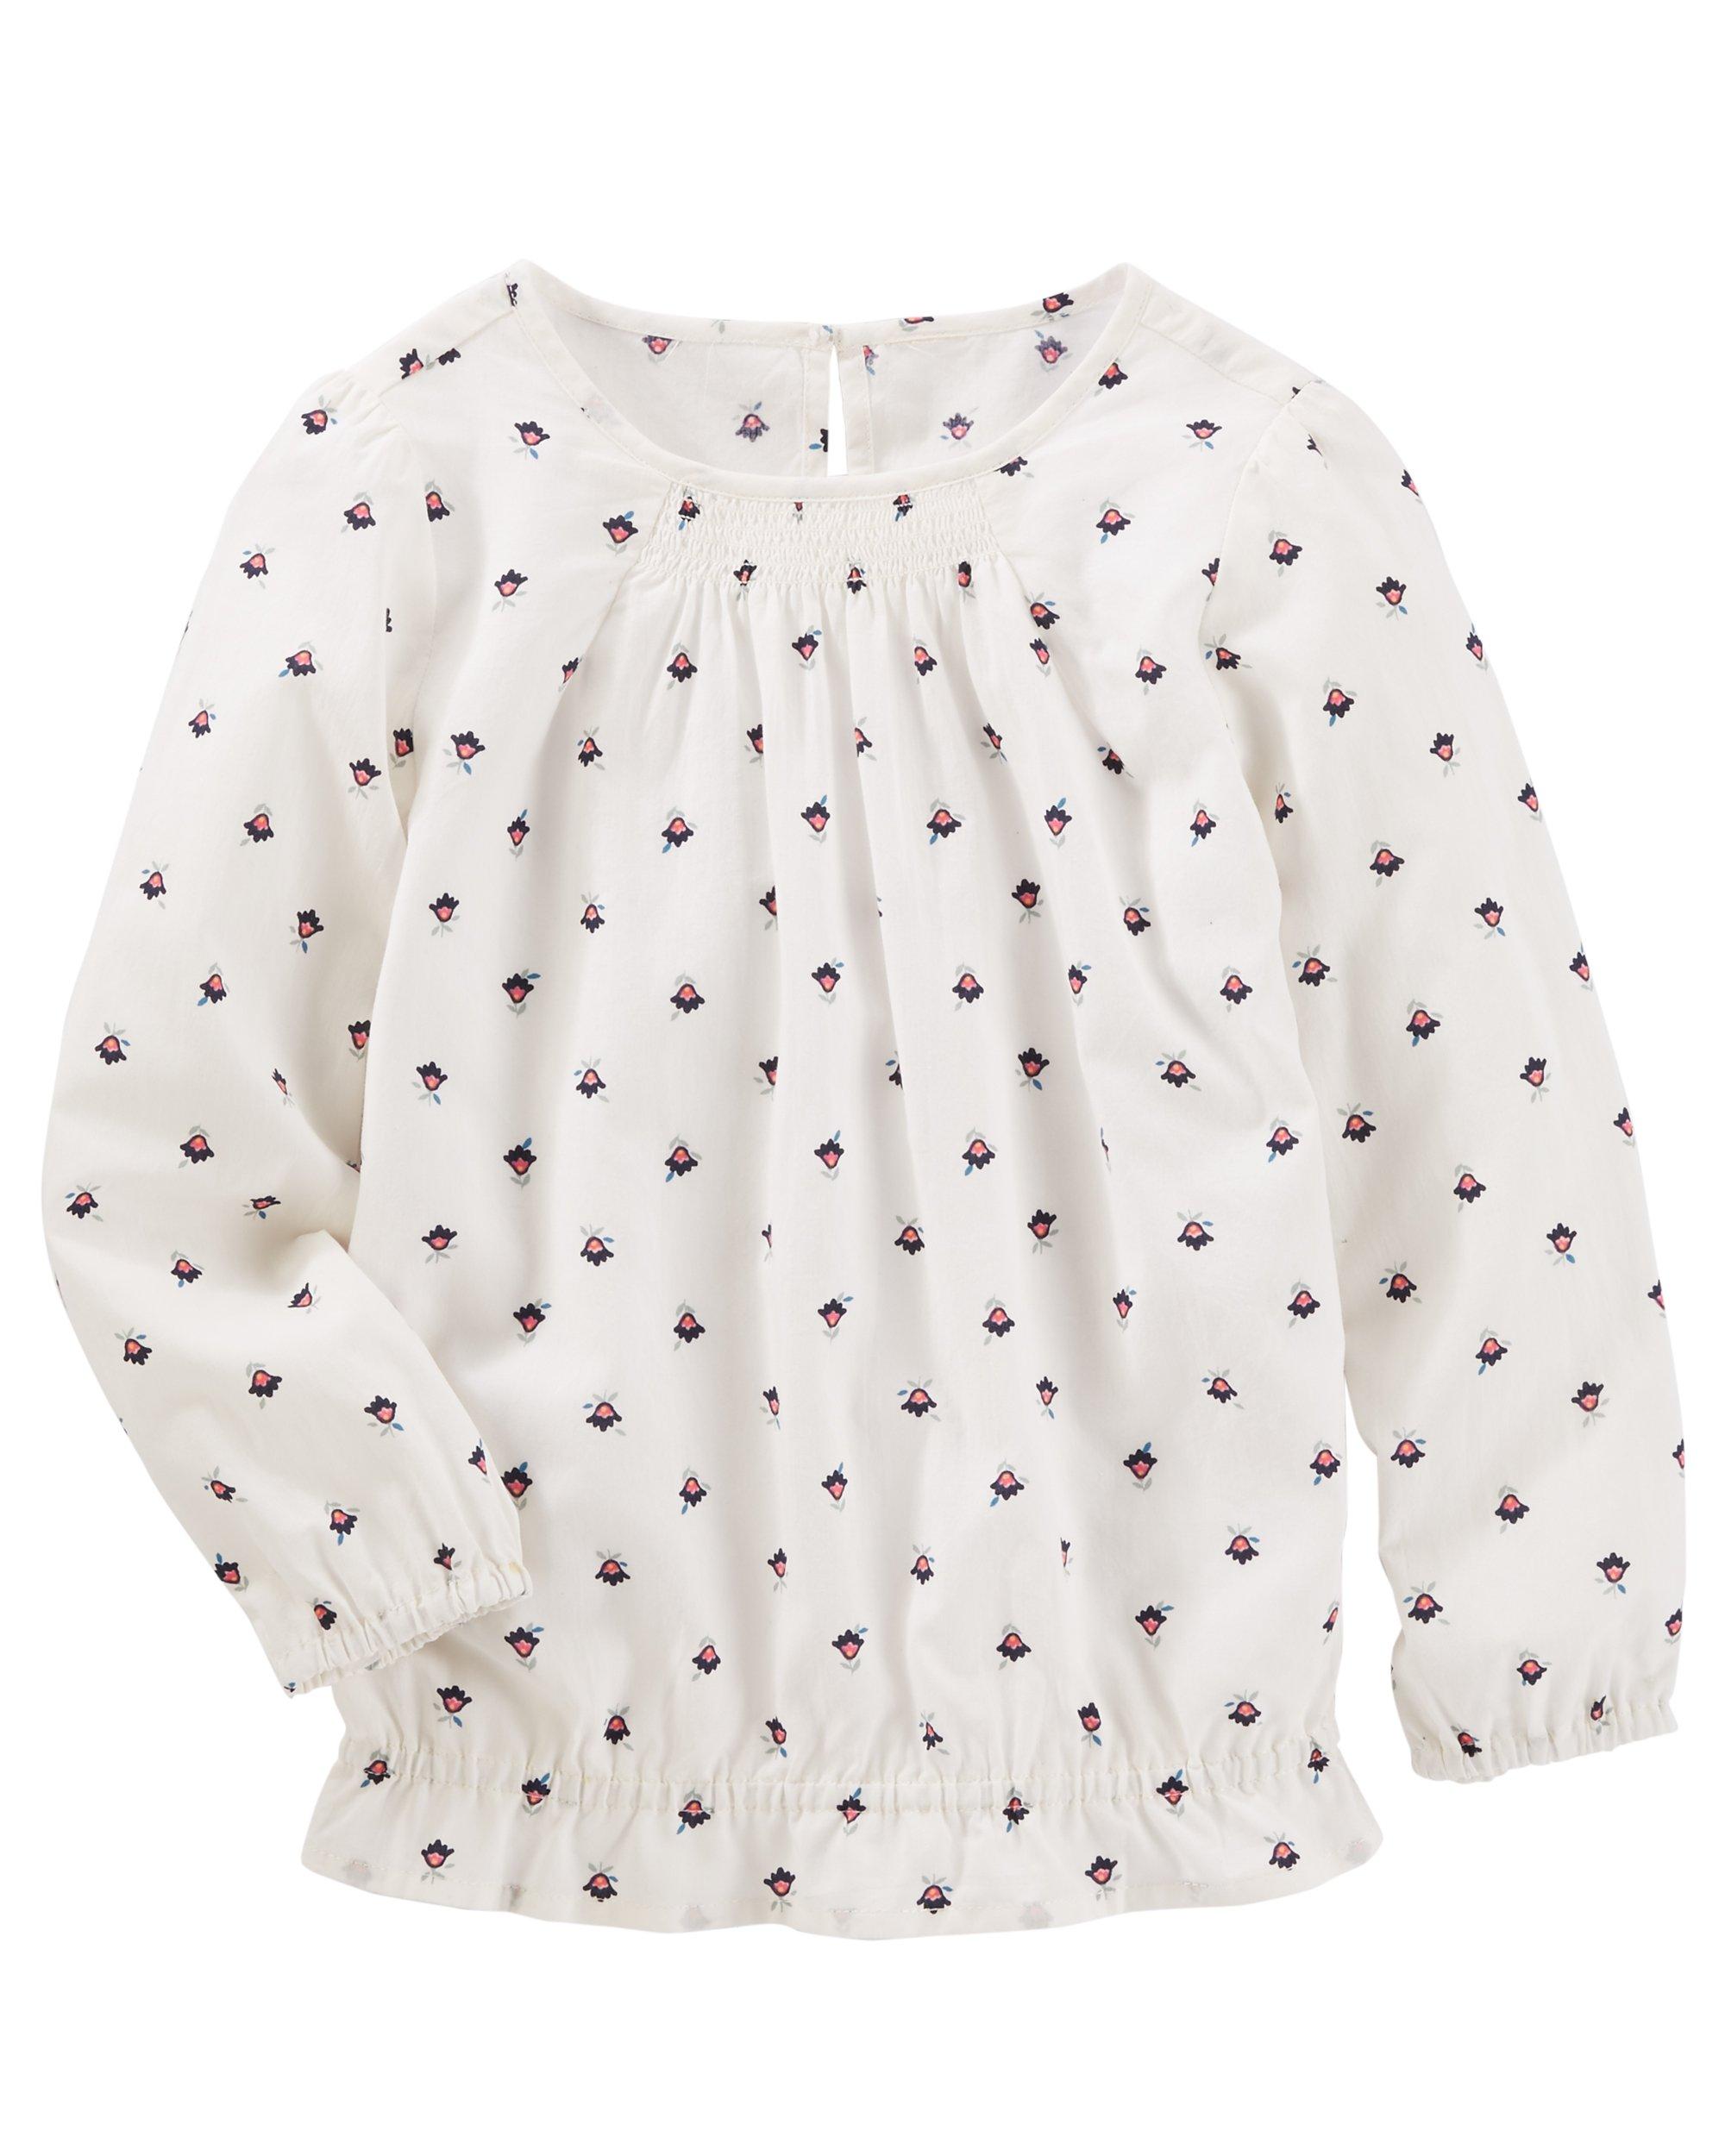 Osh Kosh Girls' Kids Long-Sleeve Fashion Top, White